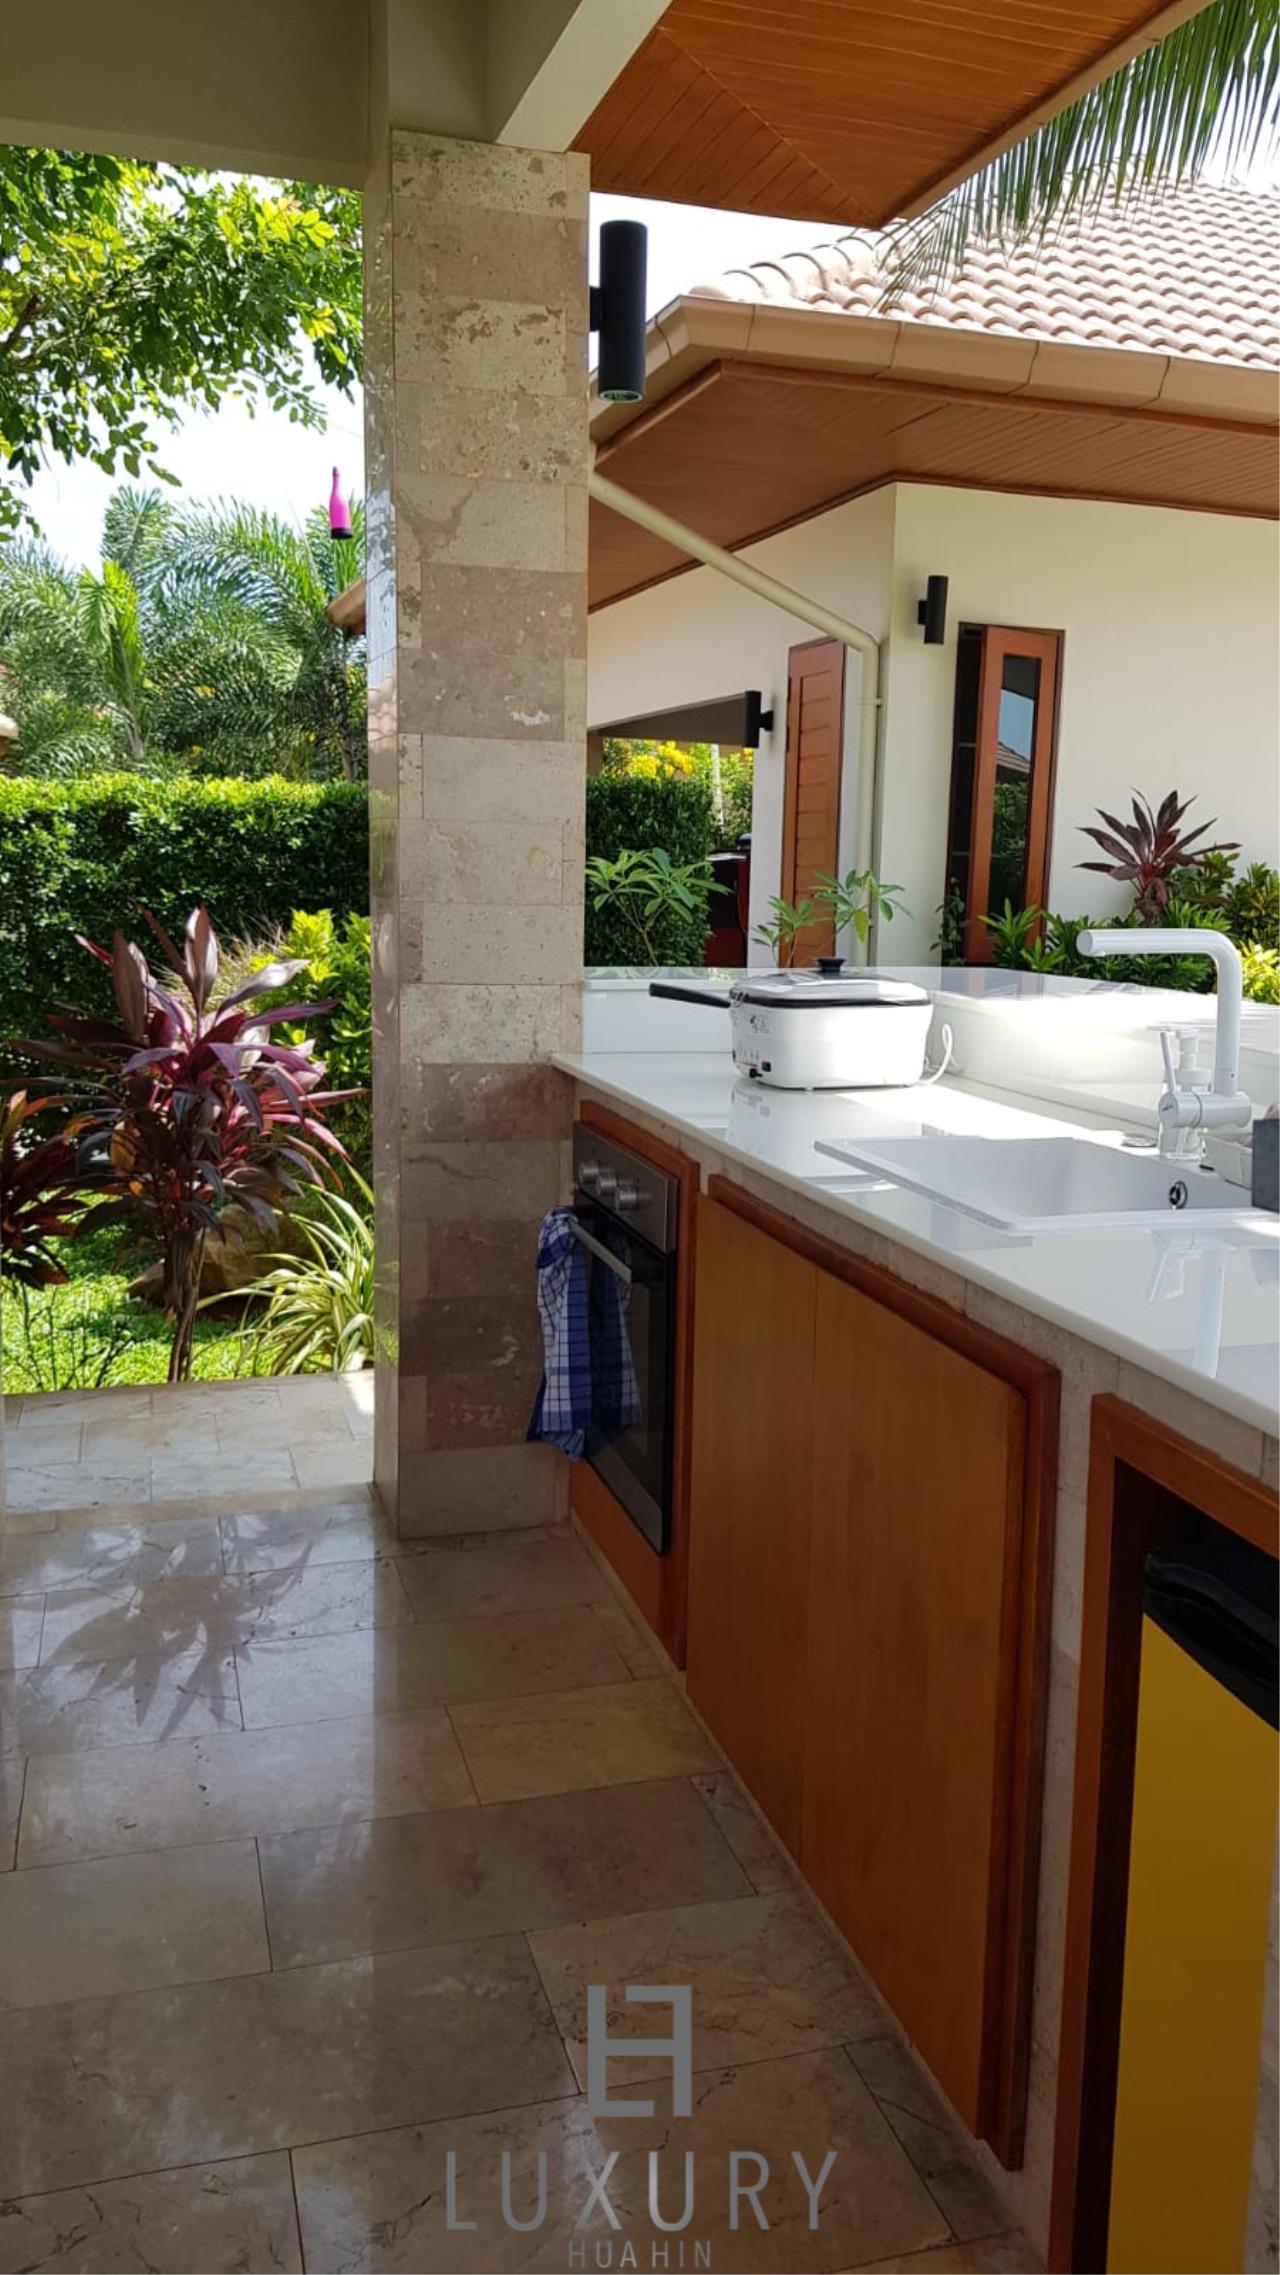 Luxury Hua Hin Property Agency's Outstanding New 4 Bedroom Pool Villa 21